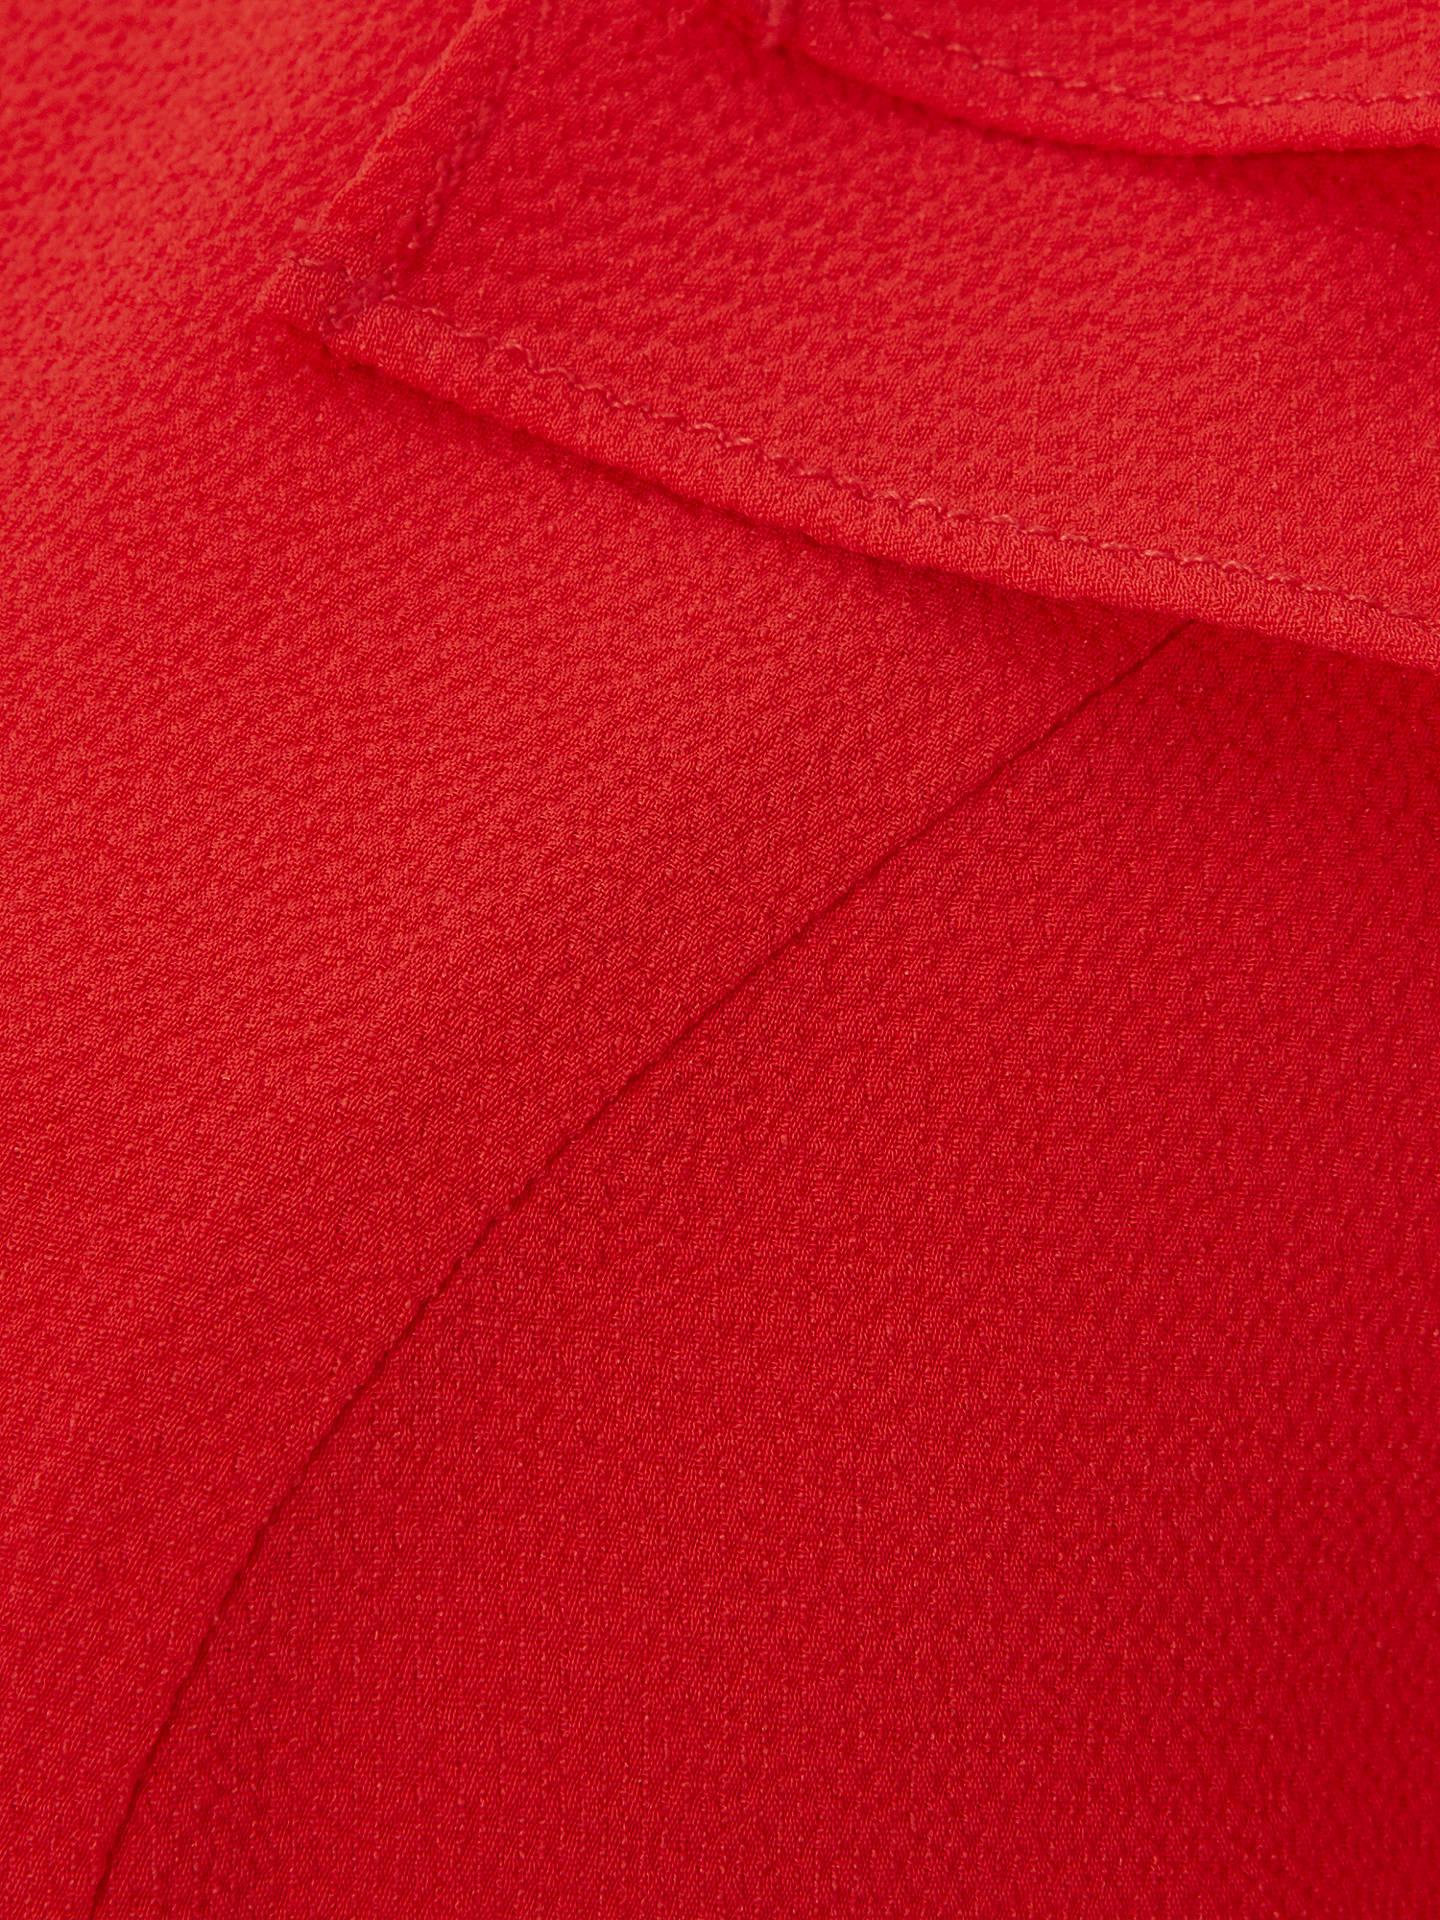 3cc65a55e3b ... Buy Damsel in a Dress Juna Ruffle Cold Shoulder Dress